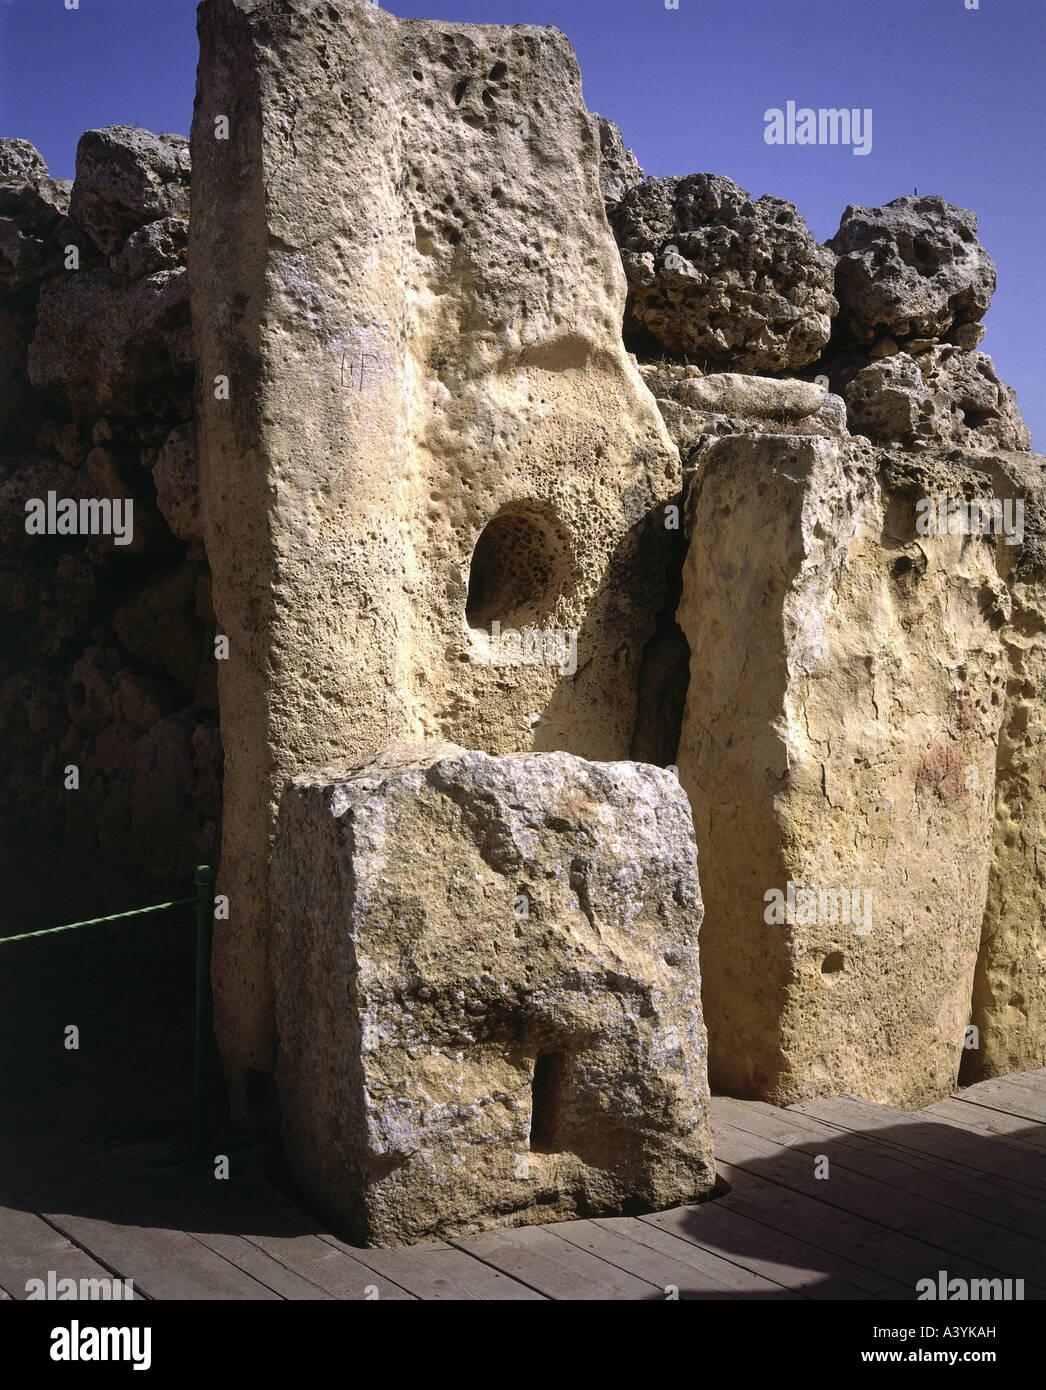 travel /geography, Malta, Gozo, buildings, Ggantija double temple, orthostat, circa 3800 - 3600 B.C., historic, Stock Photo